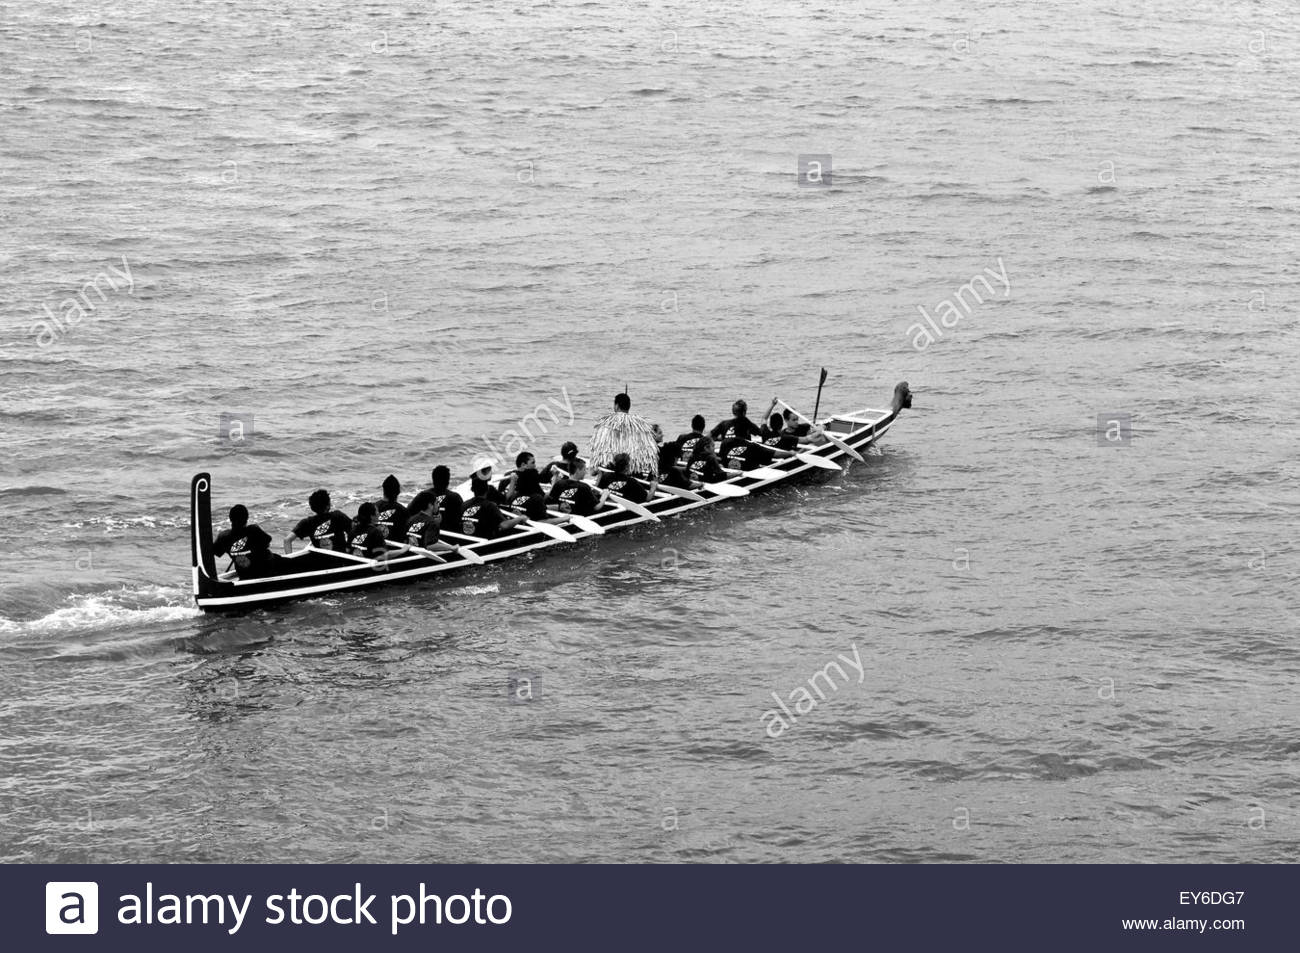 A waka (traditional Maori canoe) participates in Waitangi Day annual commemorations on Waitangi Treaty Grounds, - Stock Image